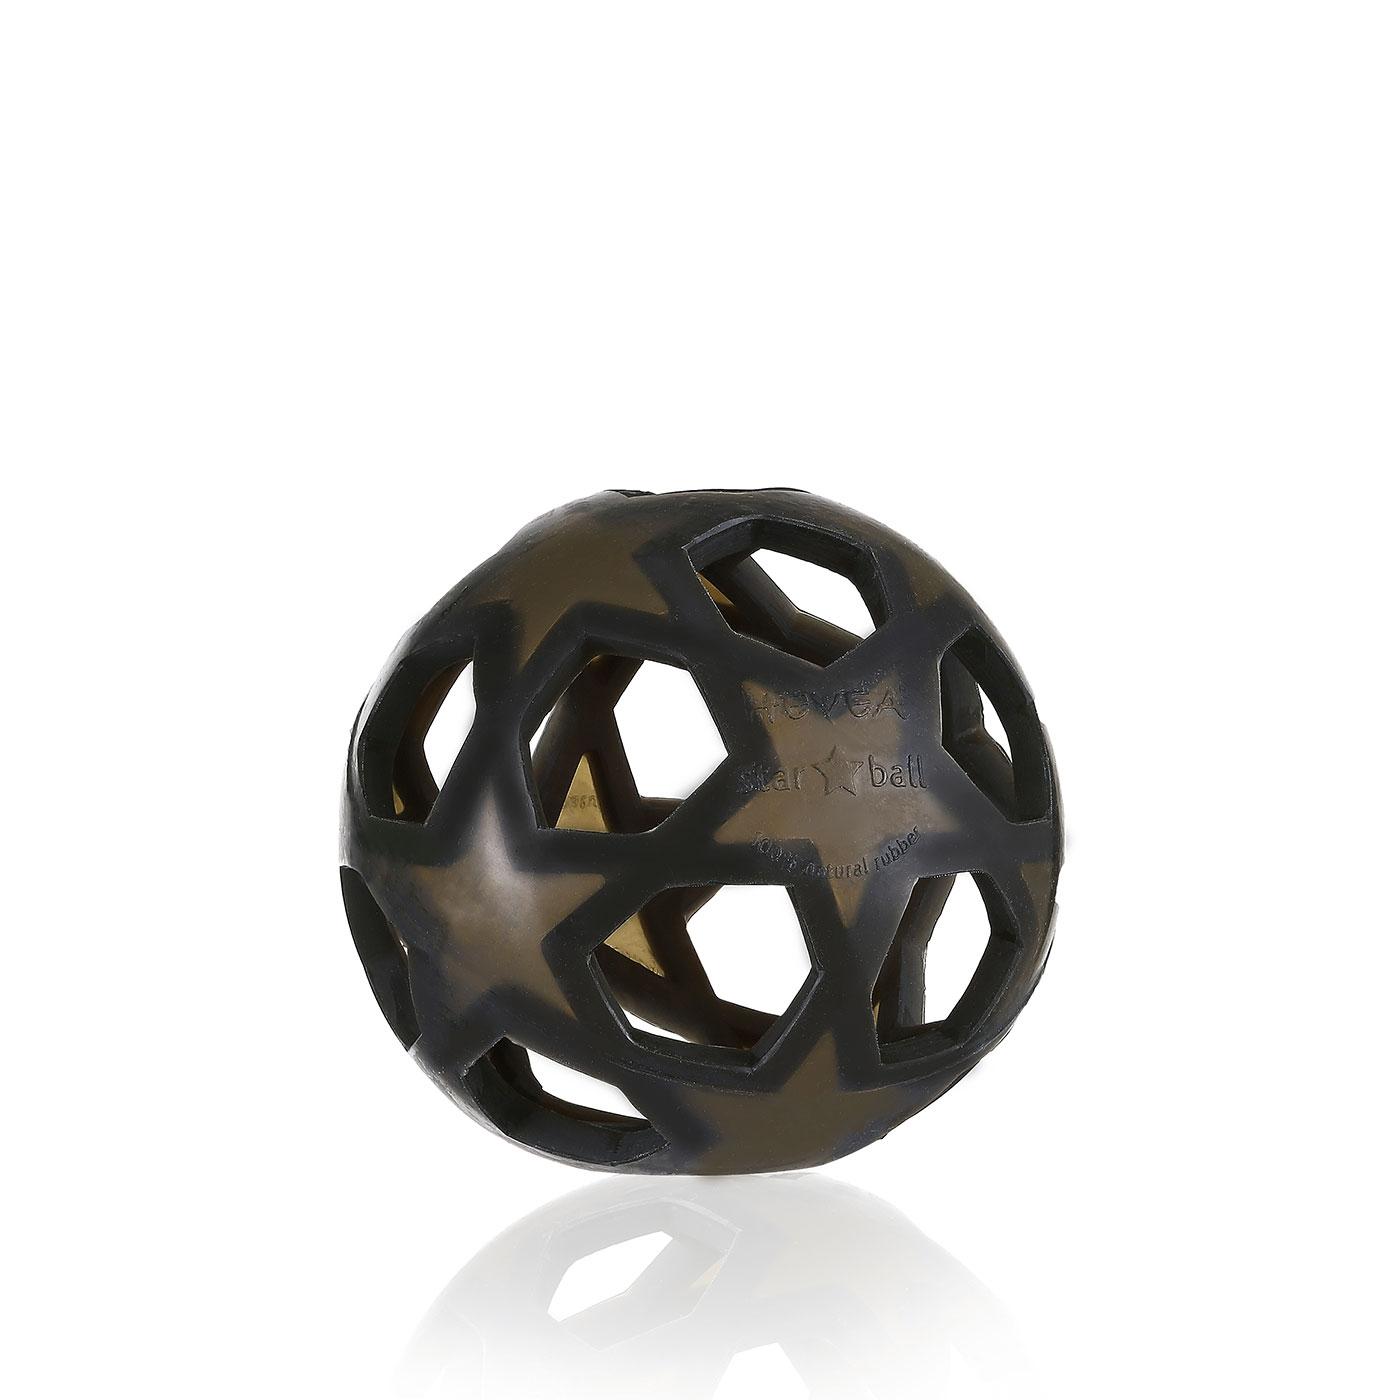 Hevea Star Ball Babyleksak - Charcoal